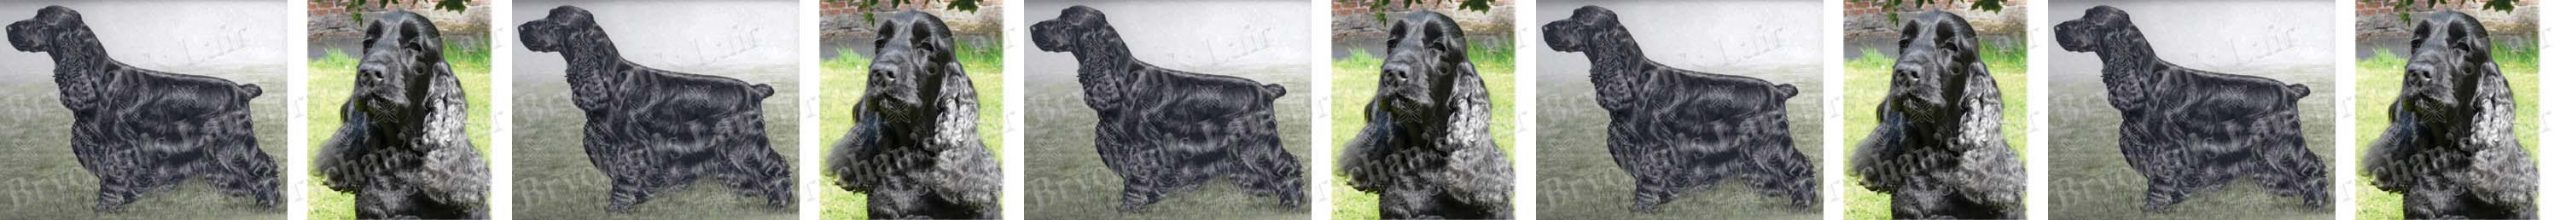 American Black Cocker Spaniel Dog Breed Custom Printed Grosgrain Ribbon